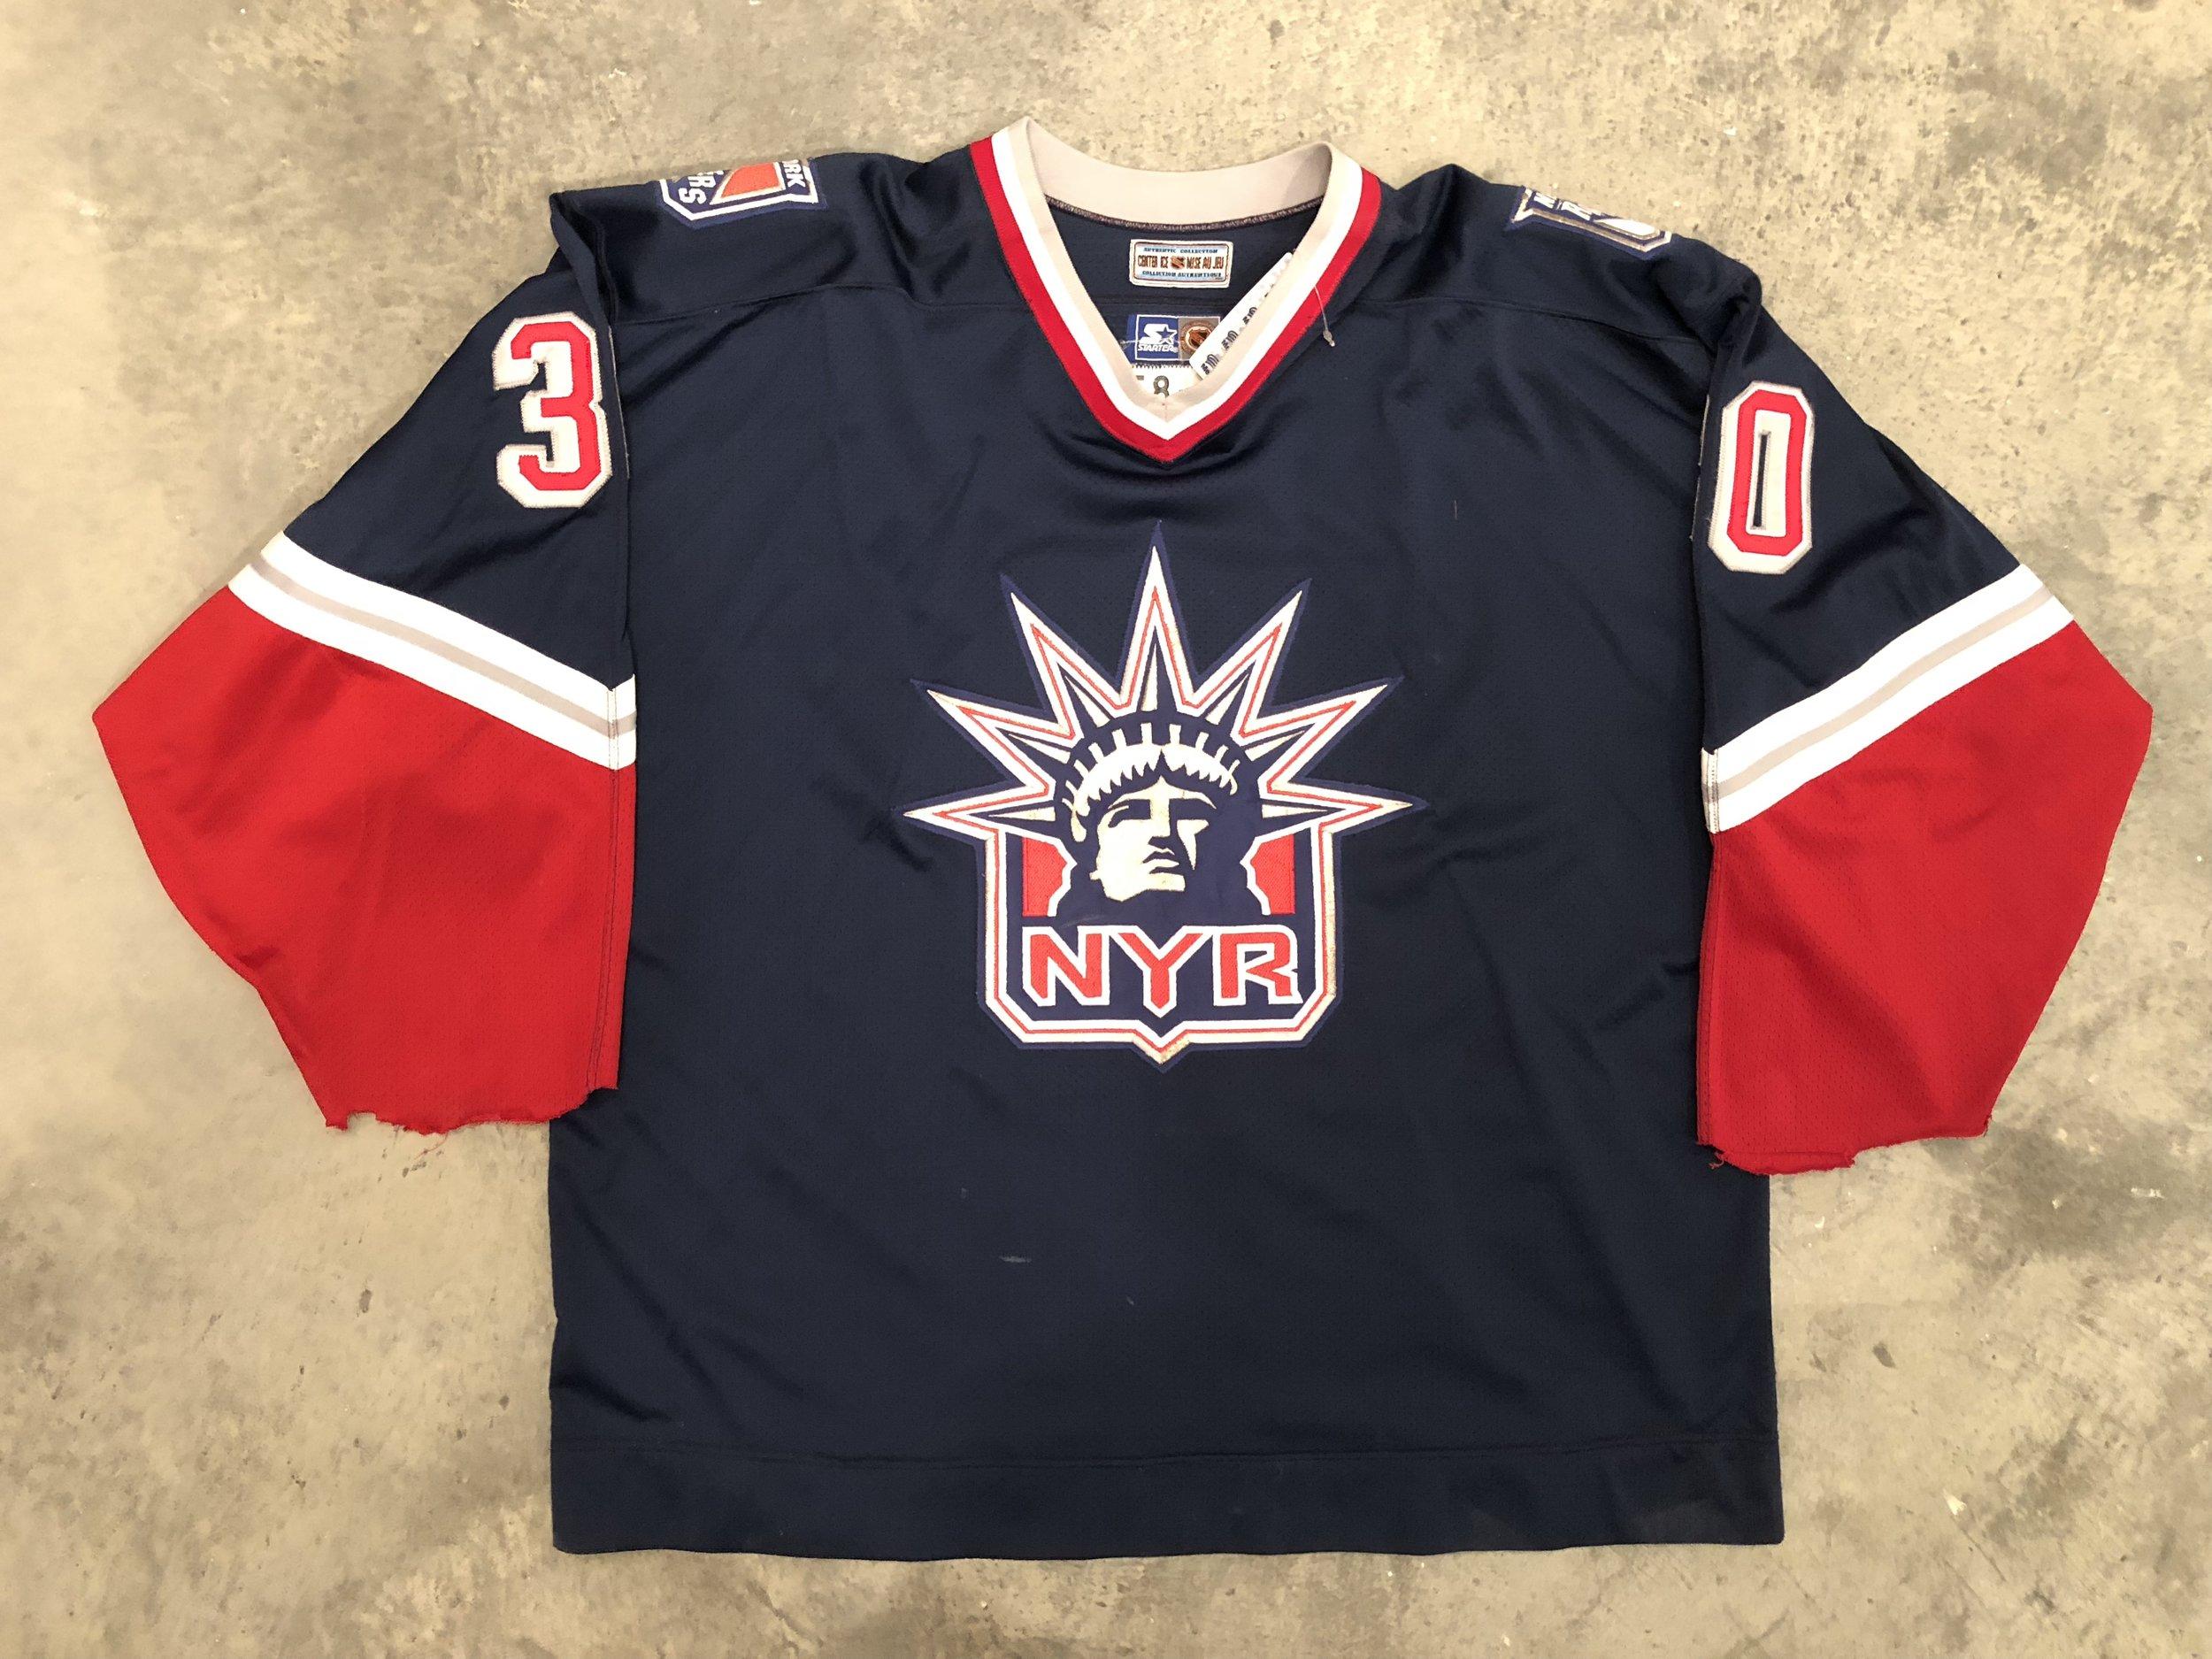 1996-97 Glenn Healy Game Worn Liberty Jersey